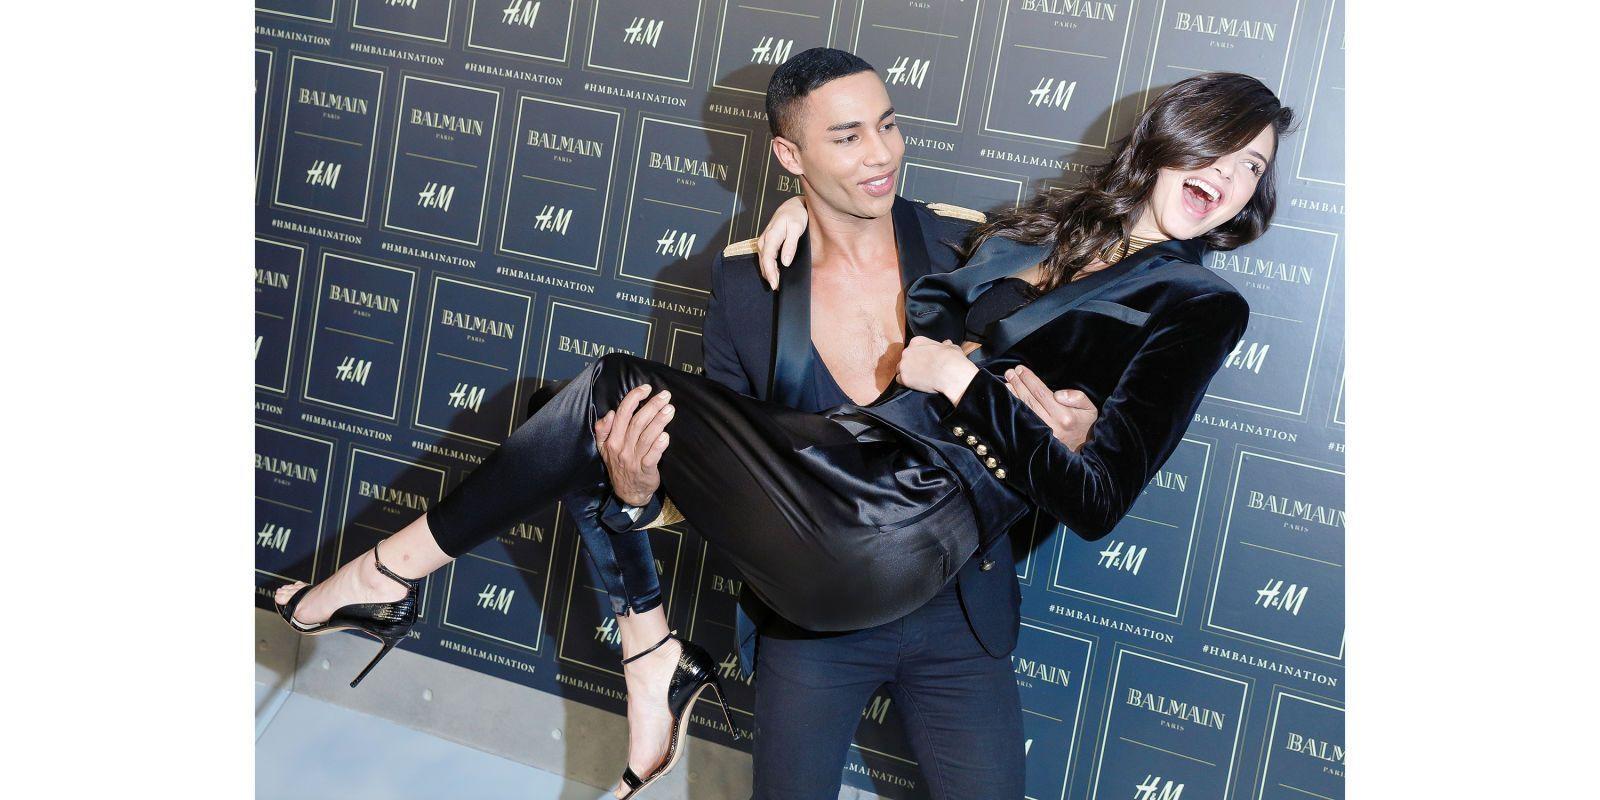 H&M Celebrates #Balmaination